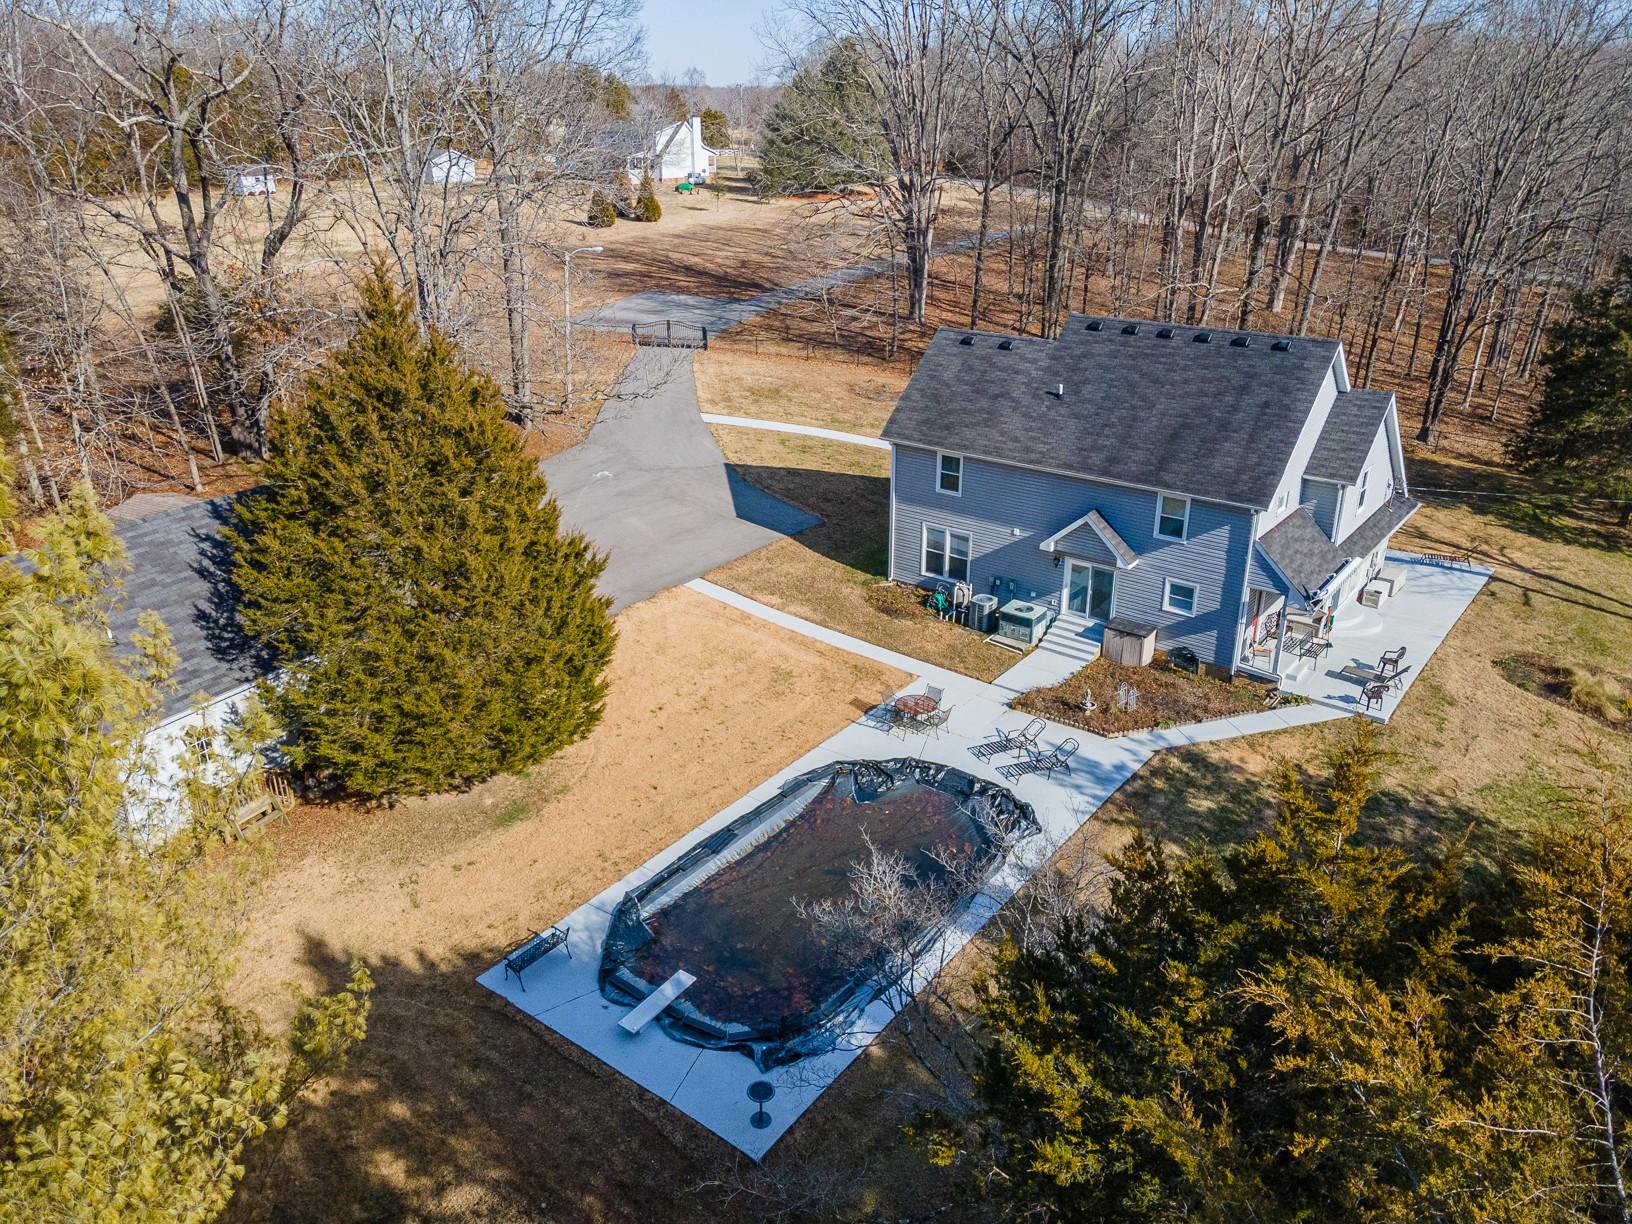 5050 Cougar Cv Property Photo - Joelton, TN real estate listing